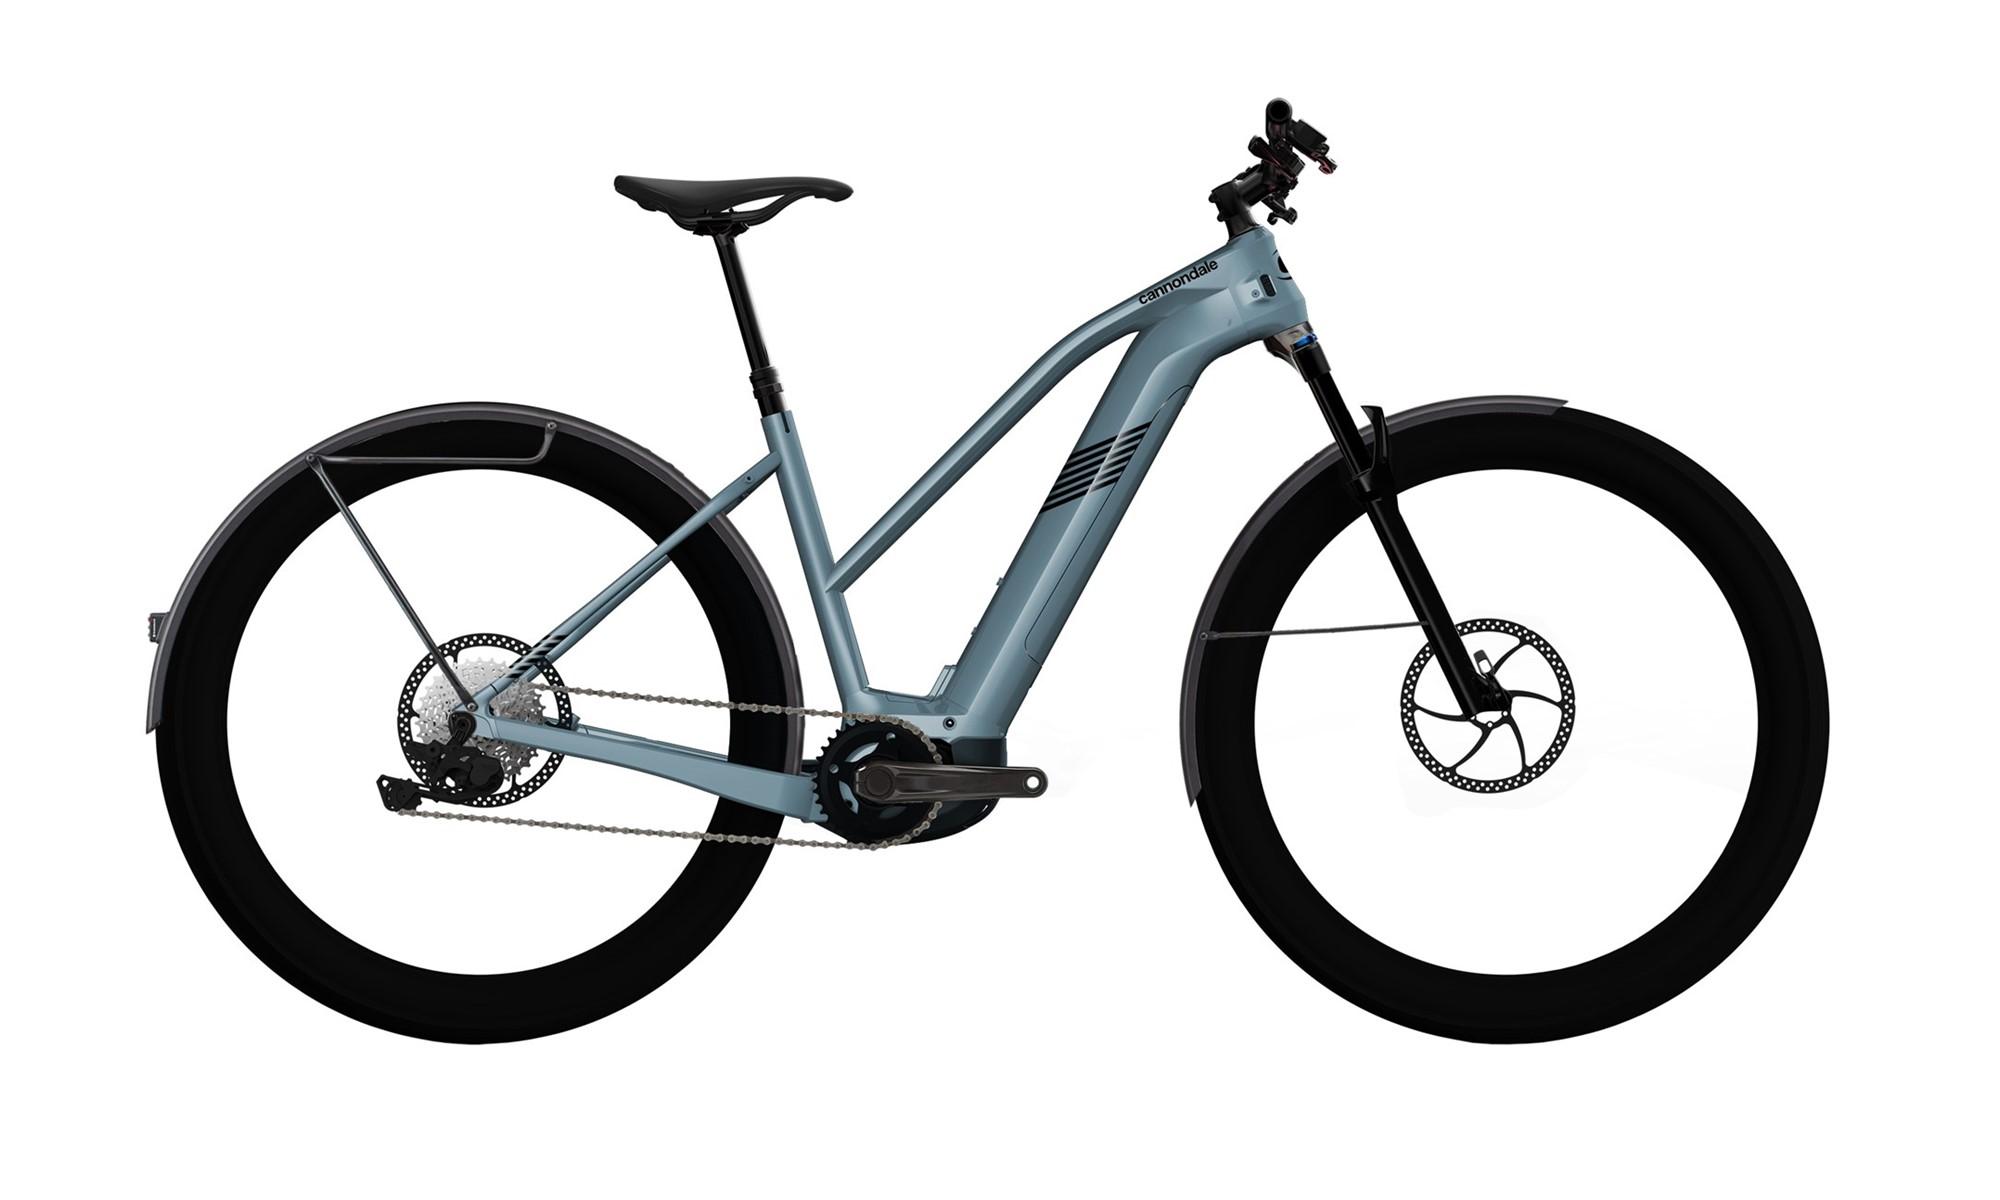 Cannondale Tesoro Neo X 2 500wh Electric Gravel Bike 2021 Graphite BLK